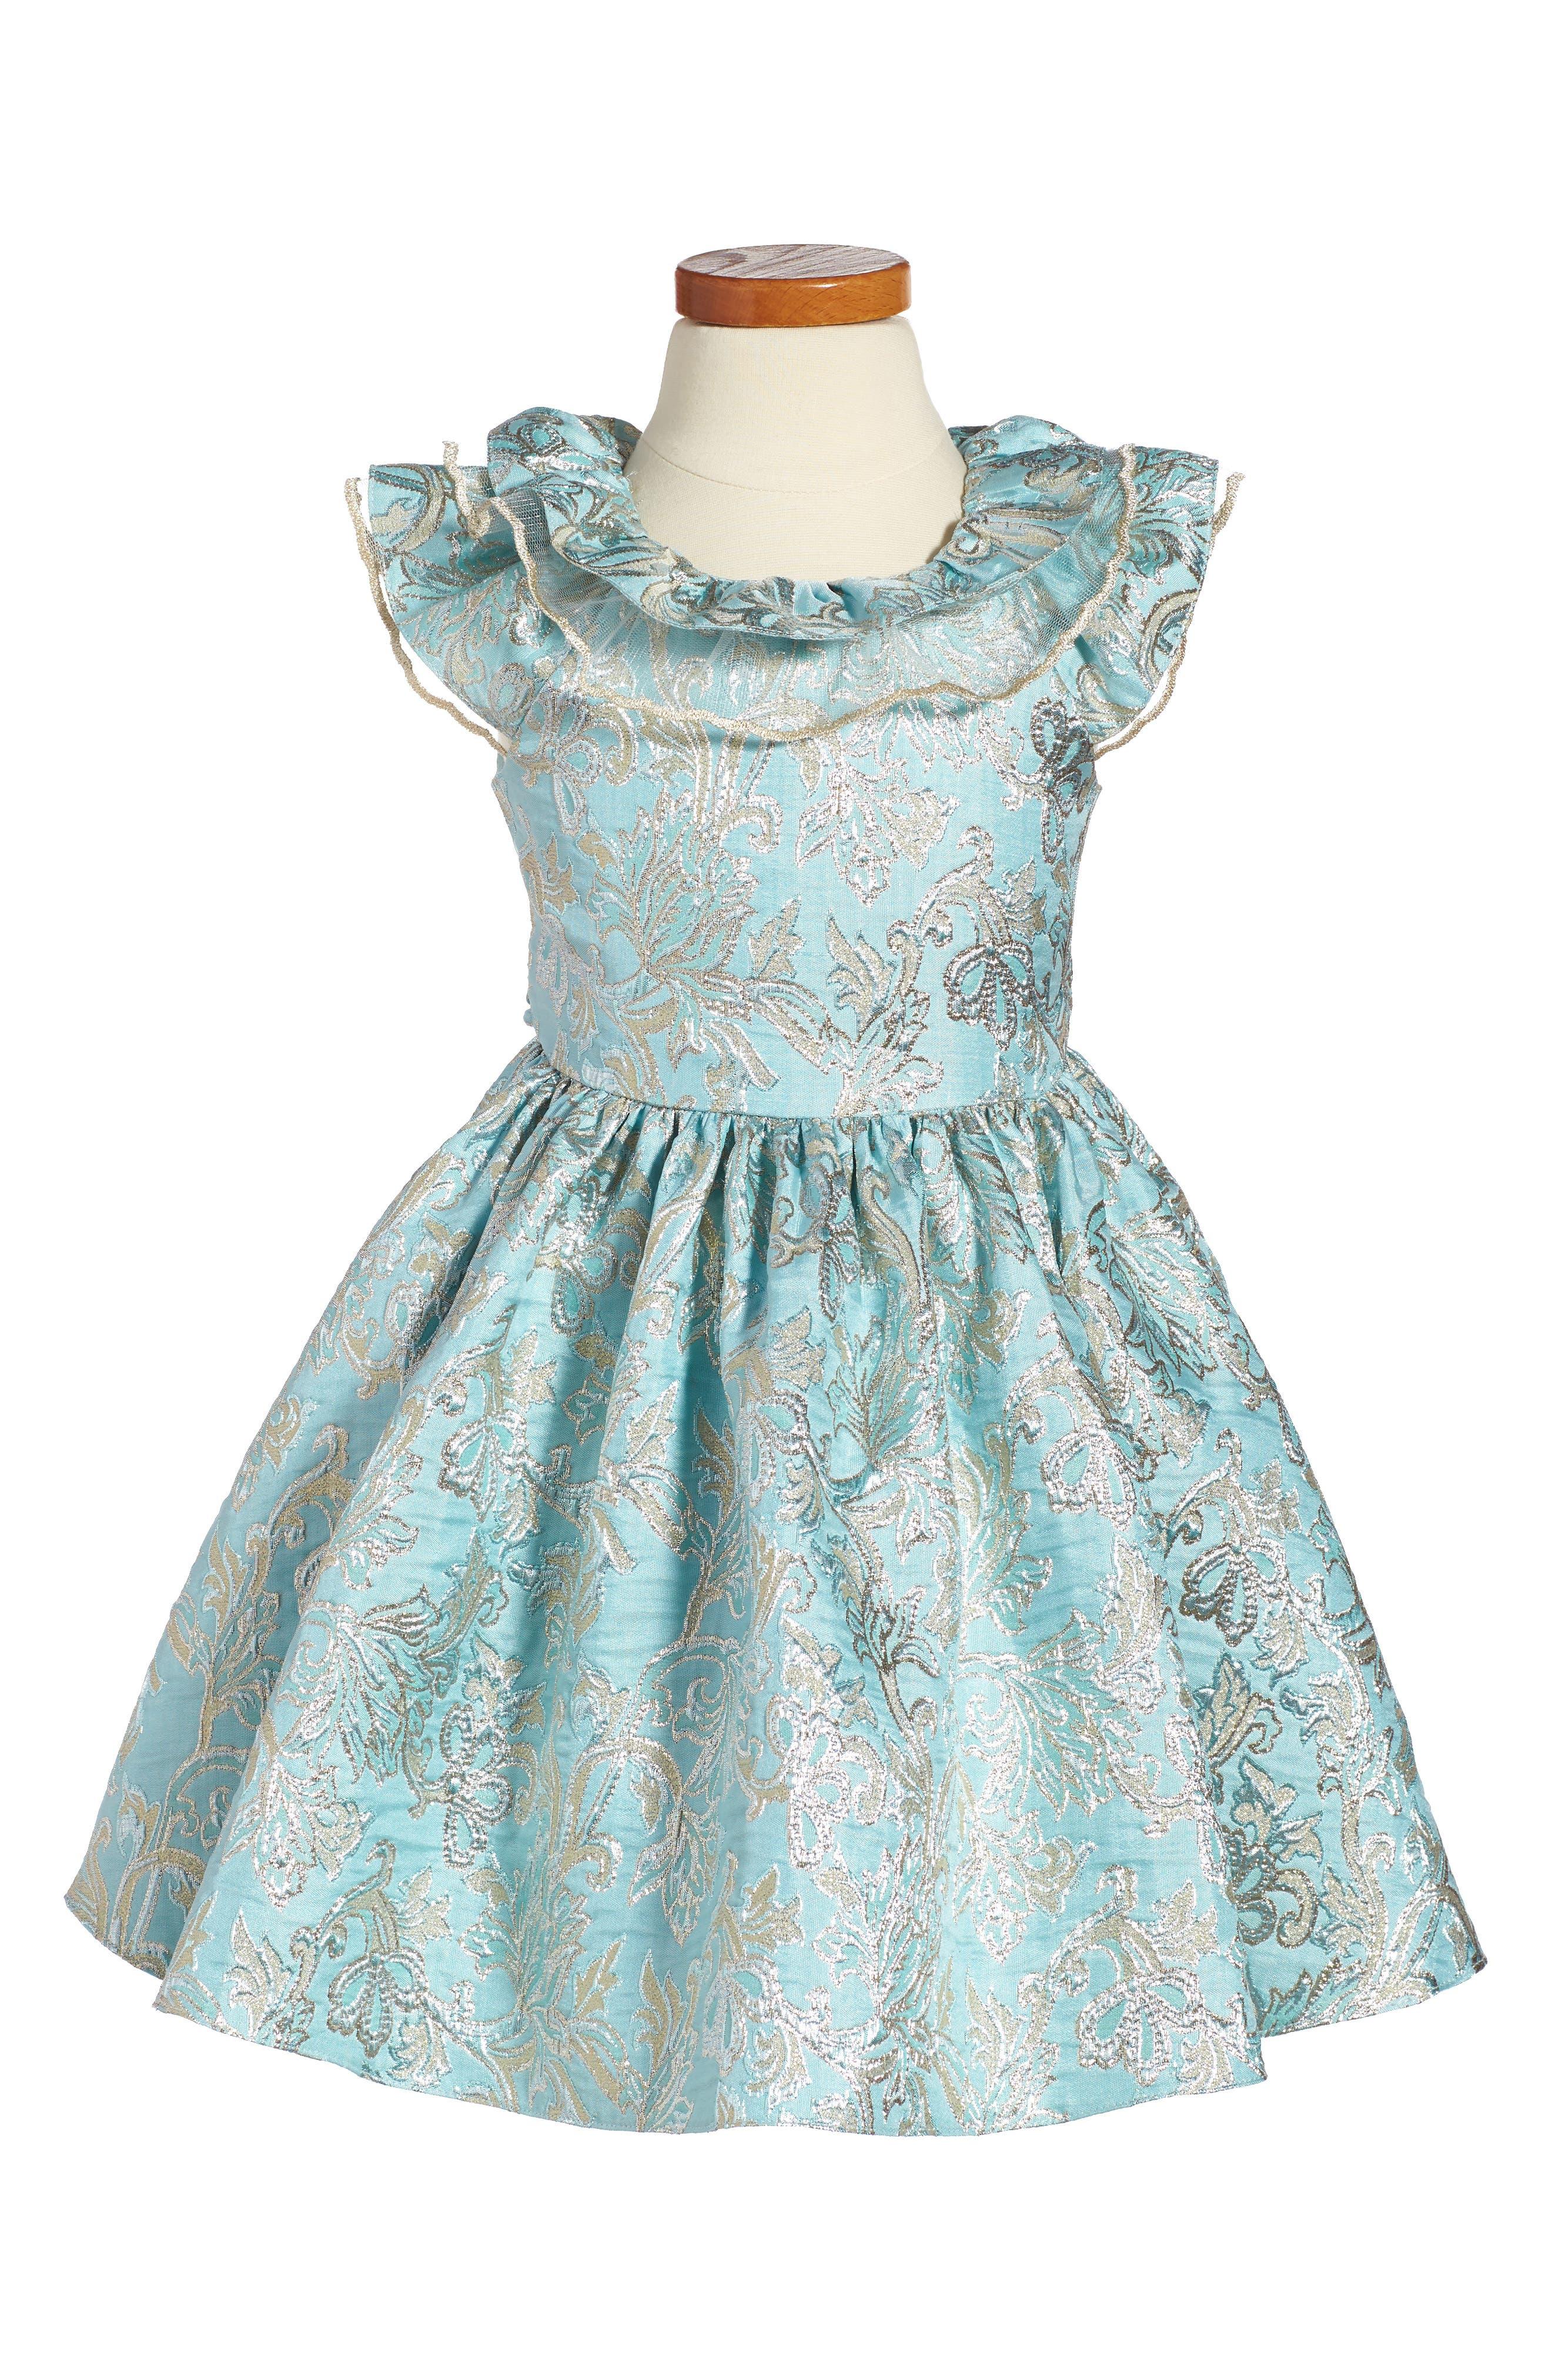 Main Image - David Chales Ruffle Neck Brocade Dress (Toddler Girls & Little Girls)